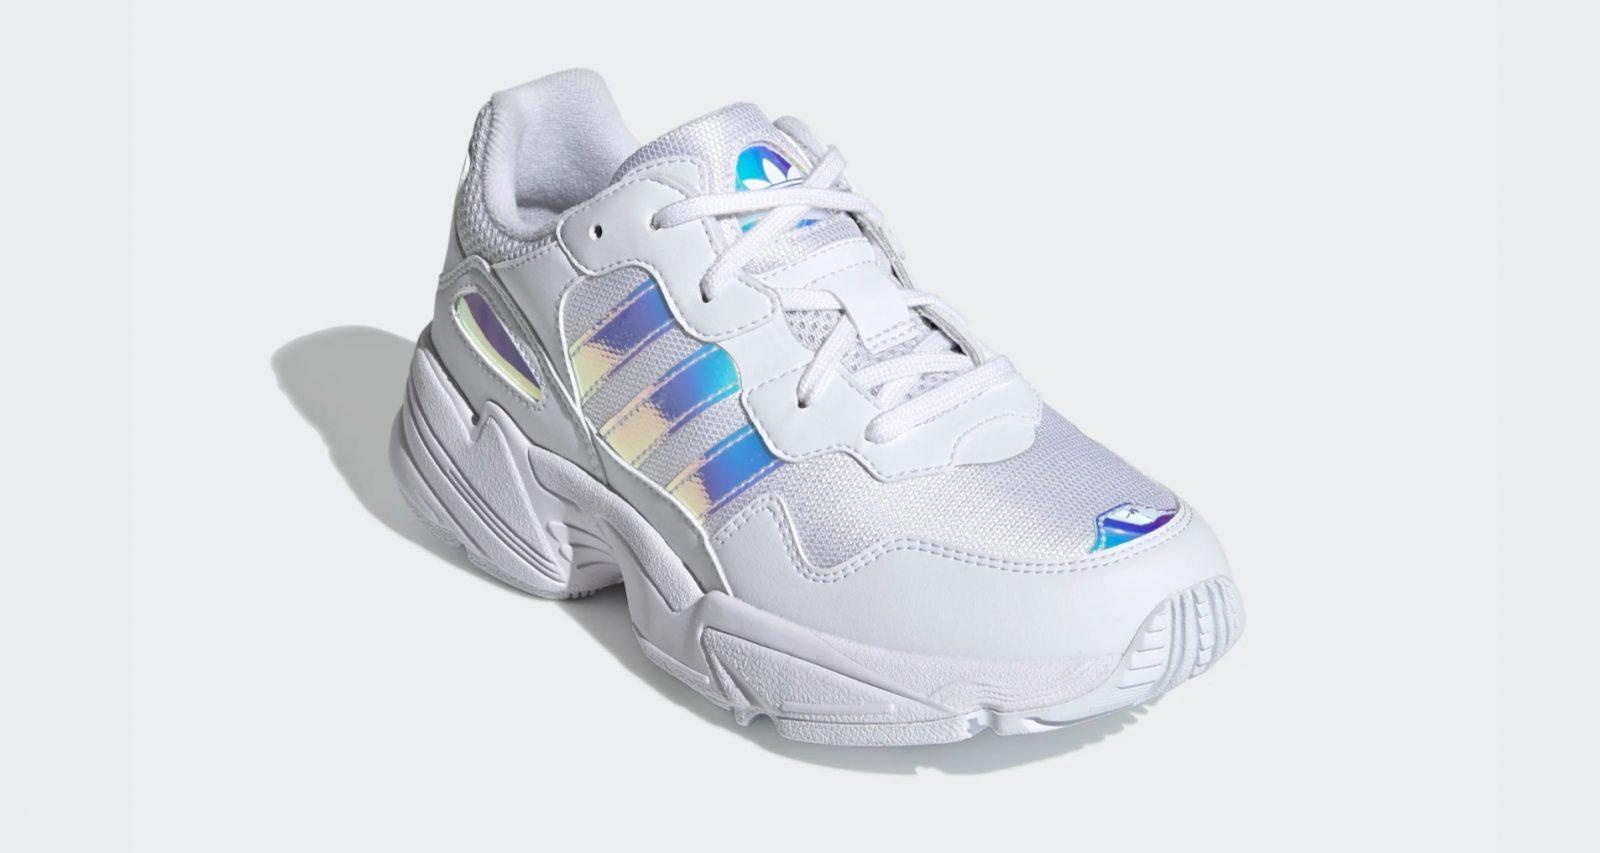 adidas Yung-96 Cloud White